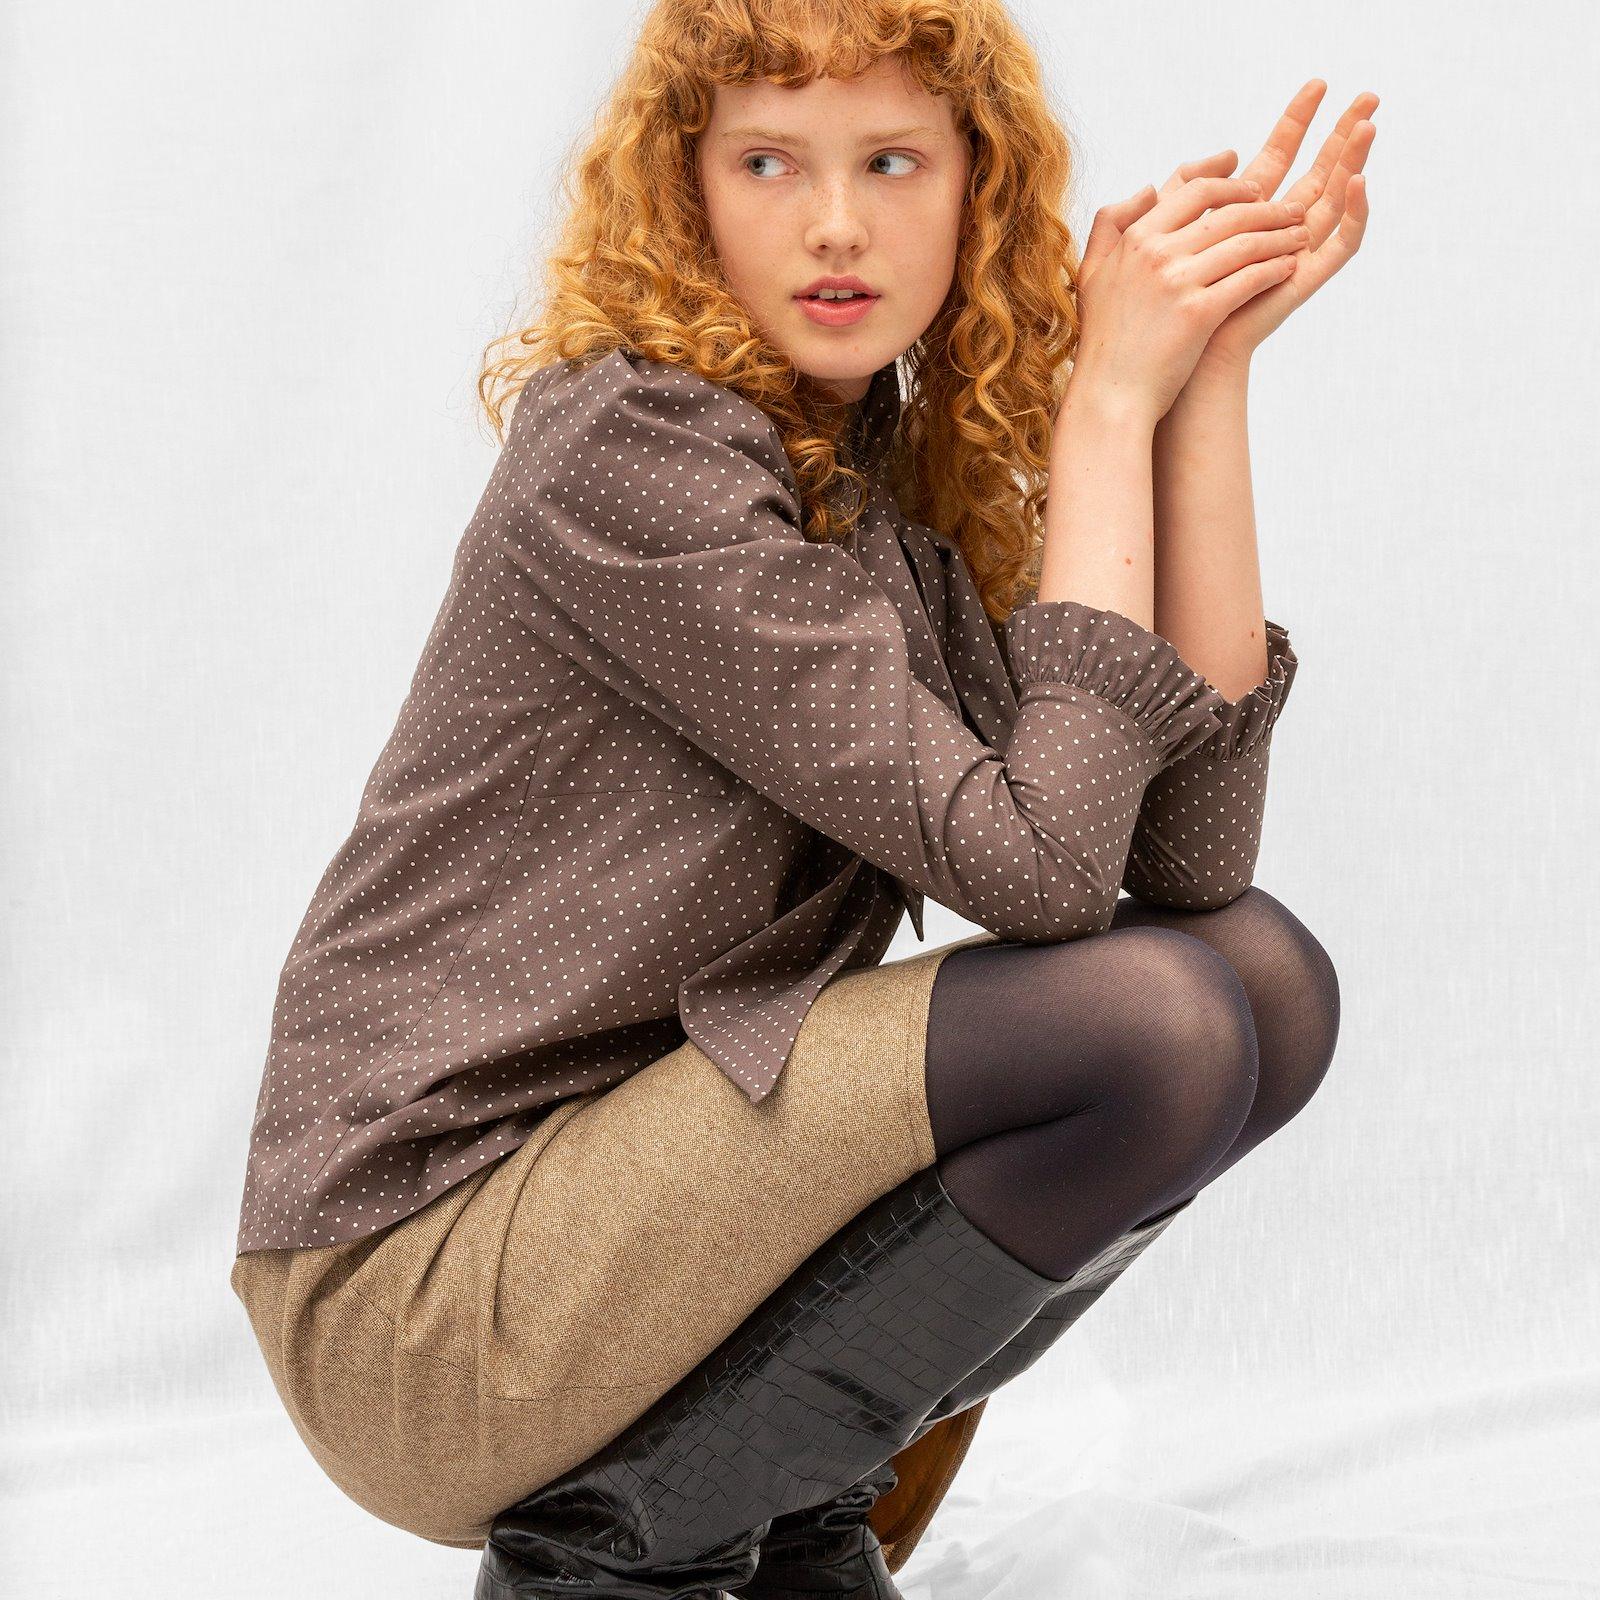 Skirt with A-shape, 38/10 p22075_852396_p21038_300227__sskit